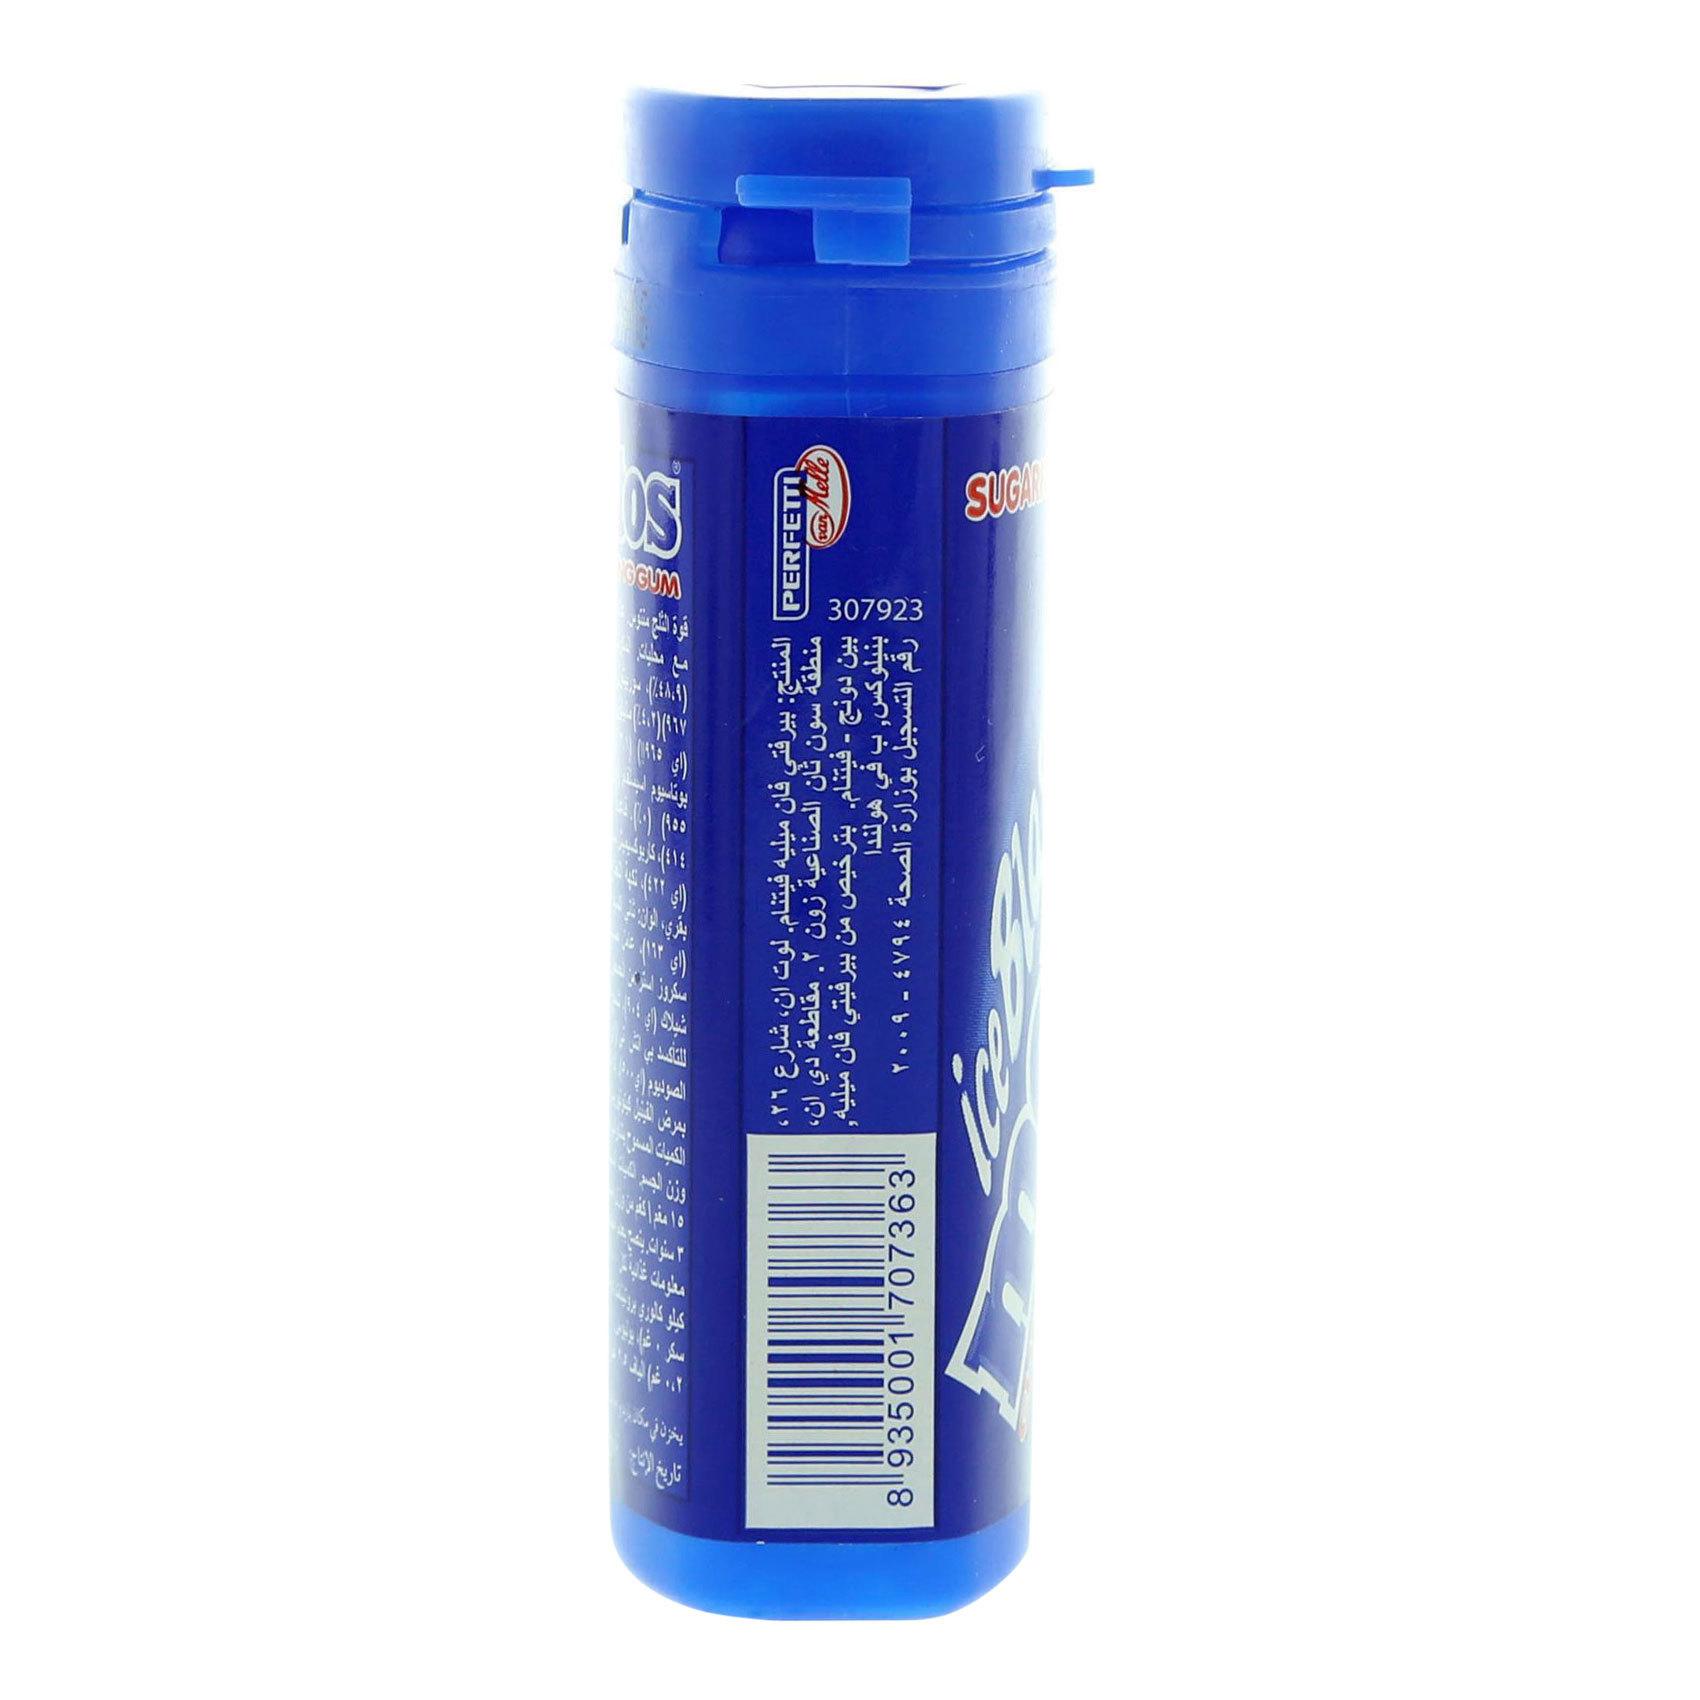 MENTOS ICE BLAST GUM MINT BTL 26G